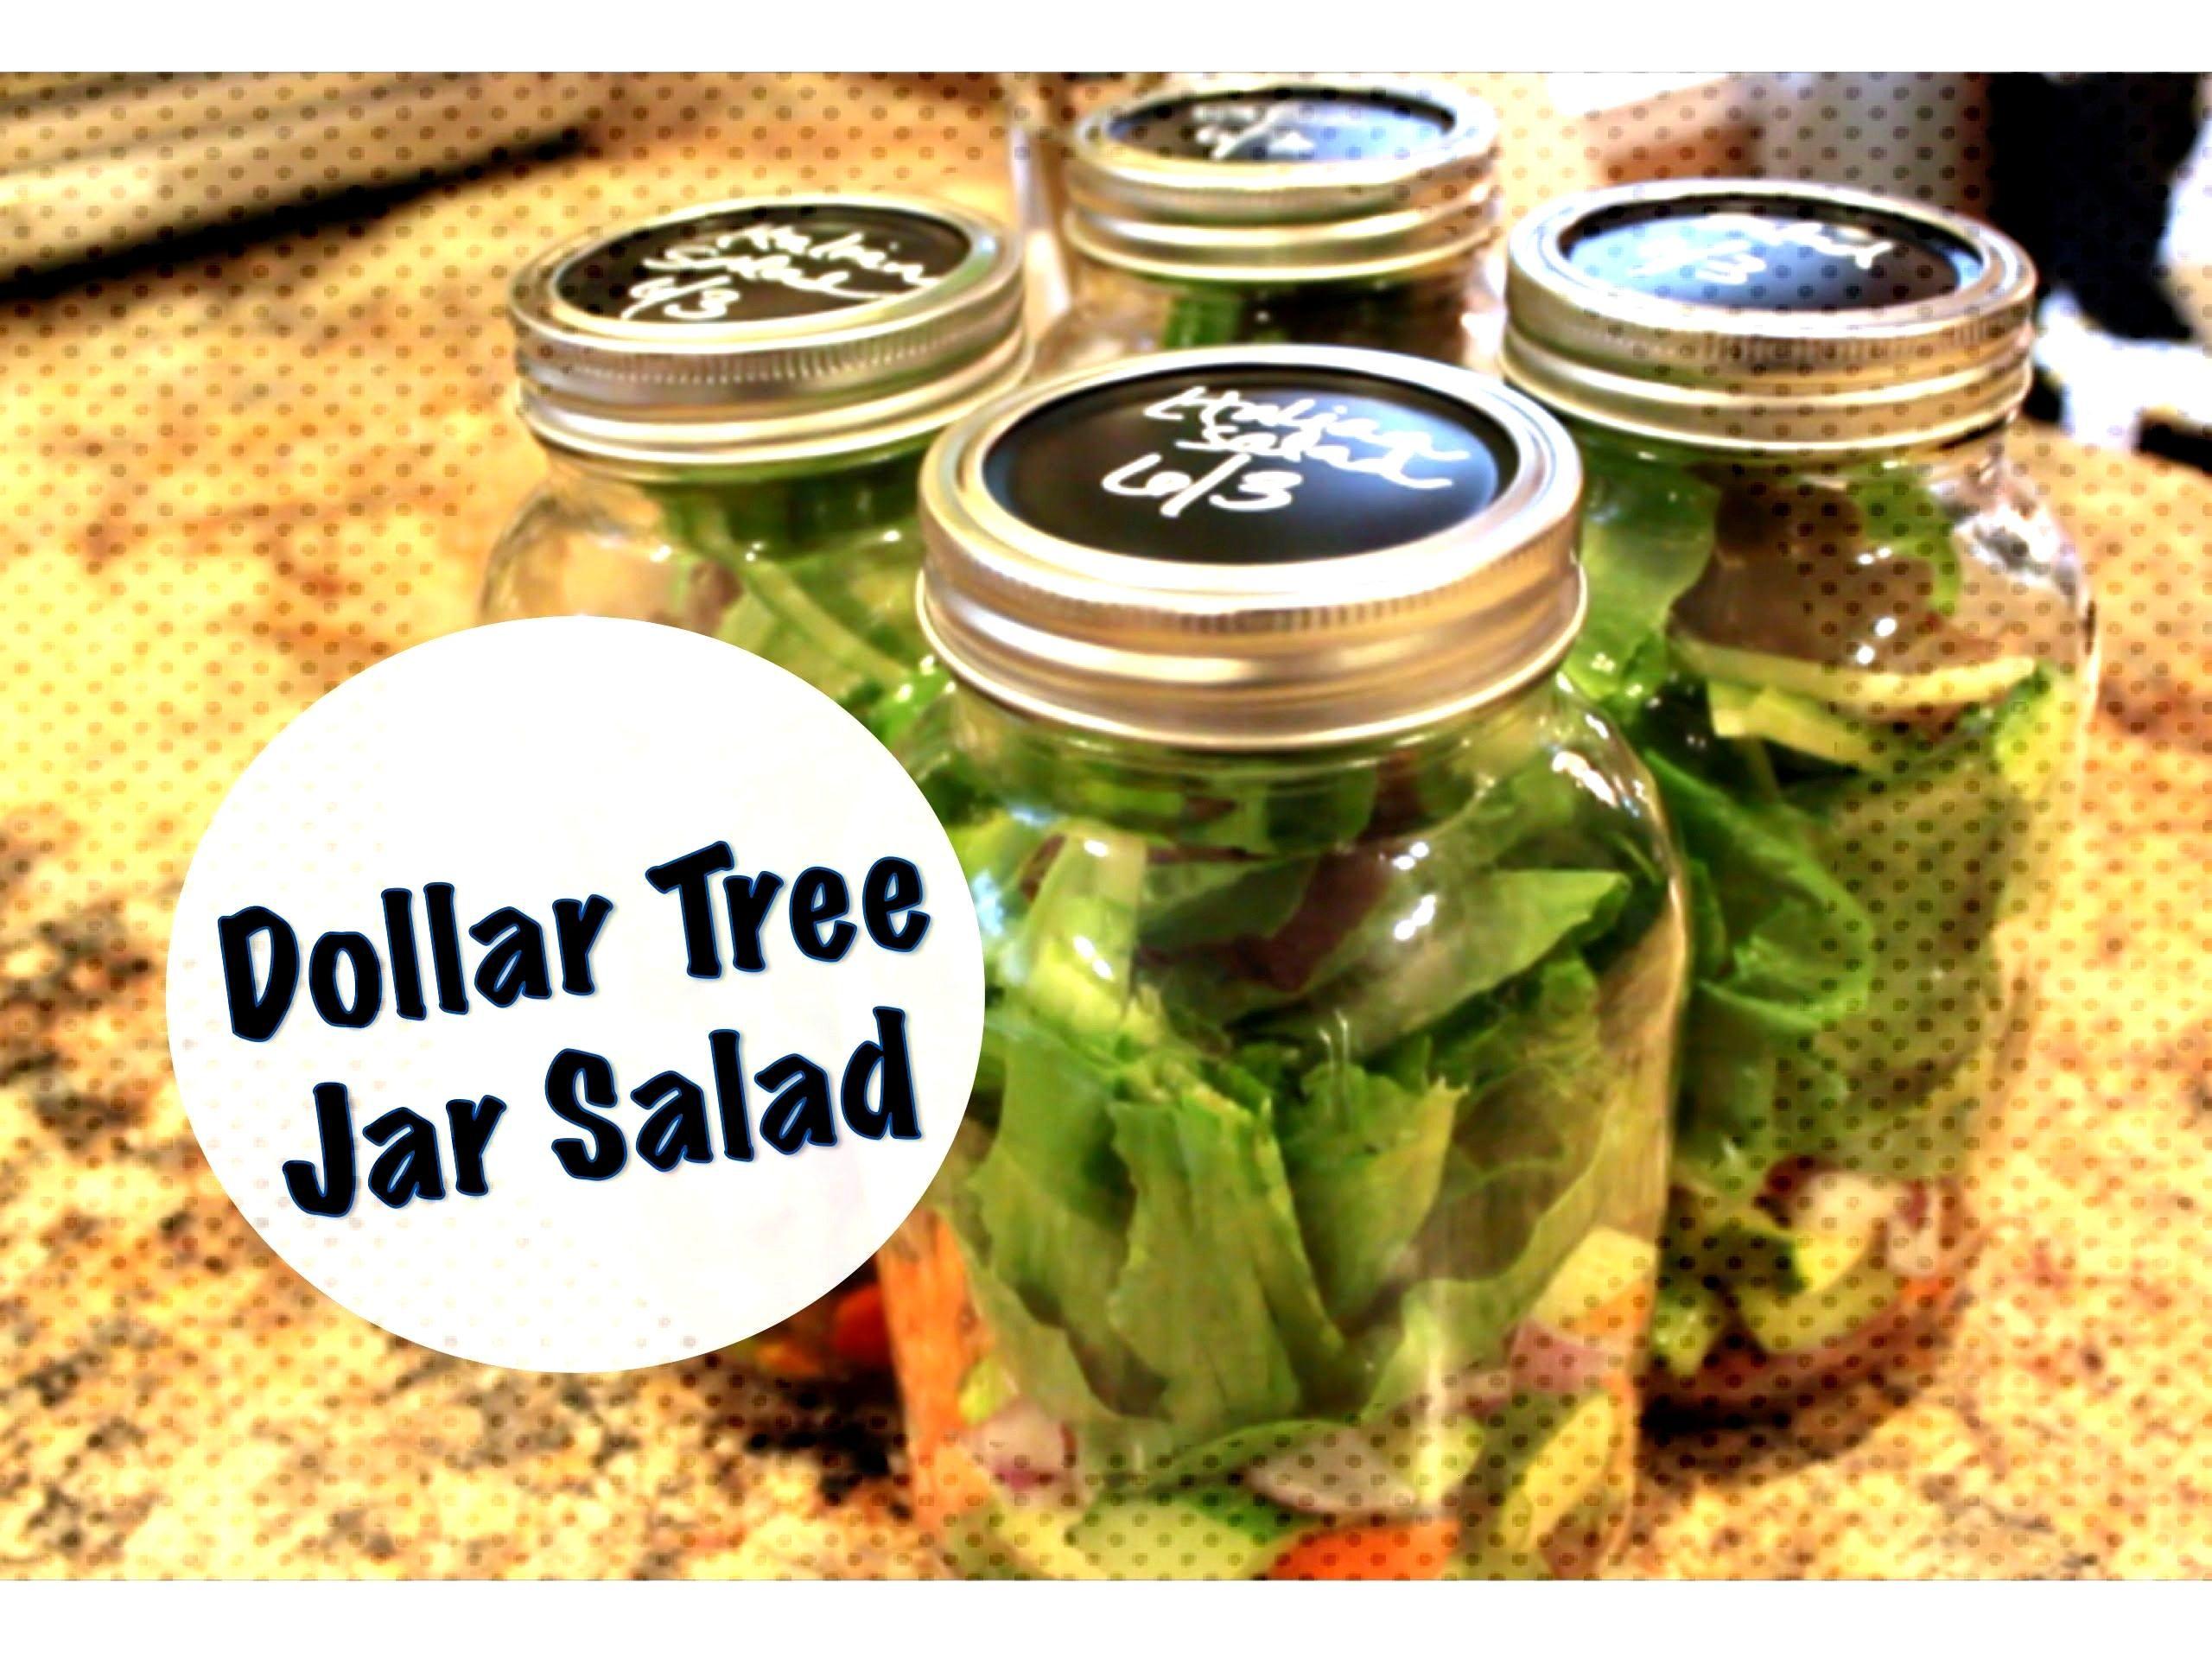 ORGANIZED LUNCHES | Dollar Tree Jar Salad - -